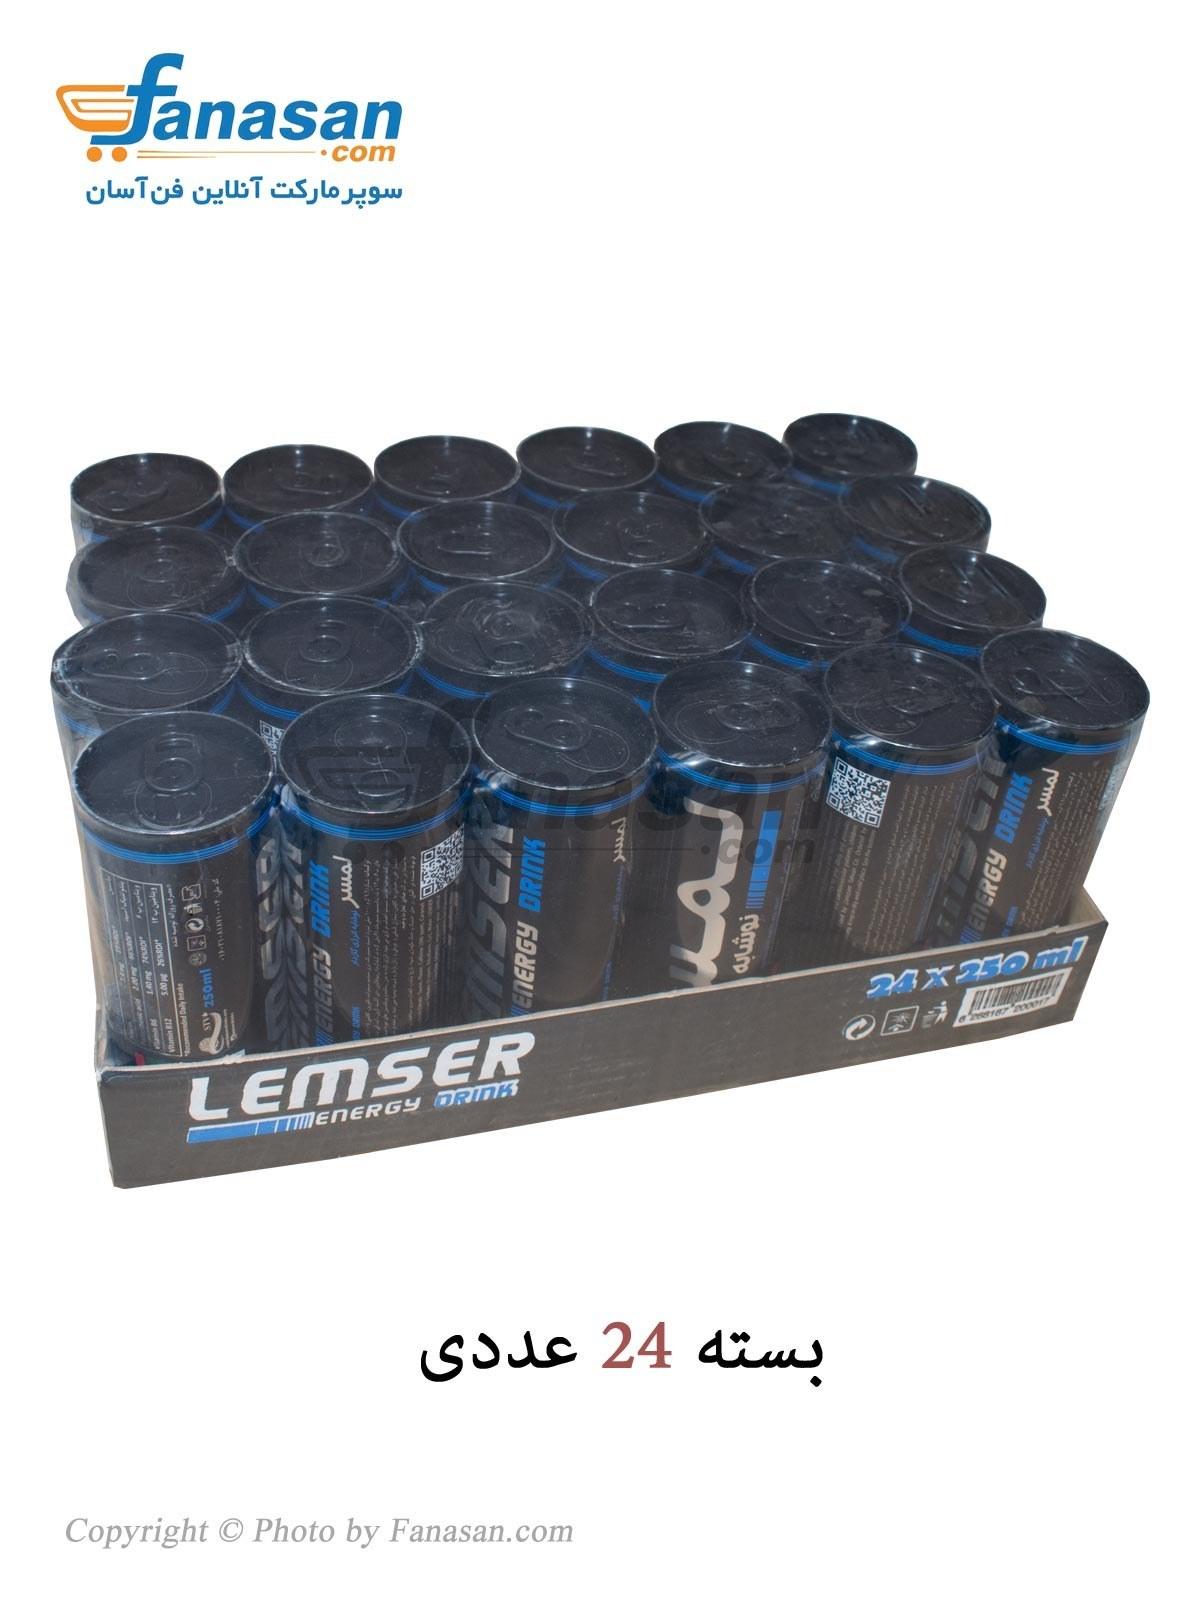 بسته 24 عددی نوشیدنی انرژی زا لمسر گازدار 250 میلی لیتر | Lamser drink energy 250 ml